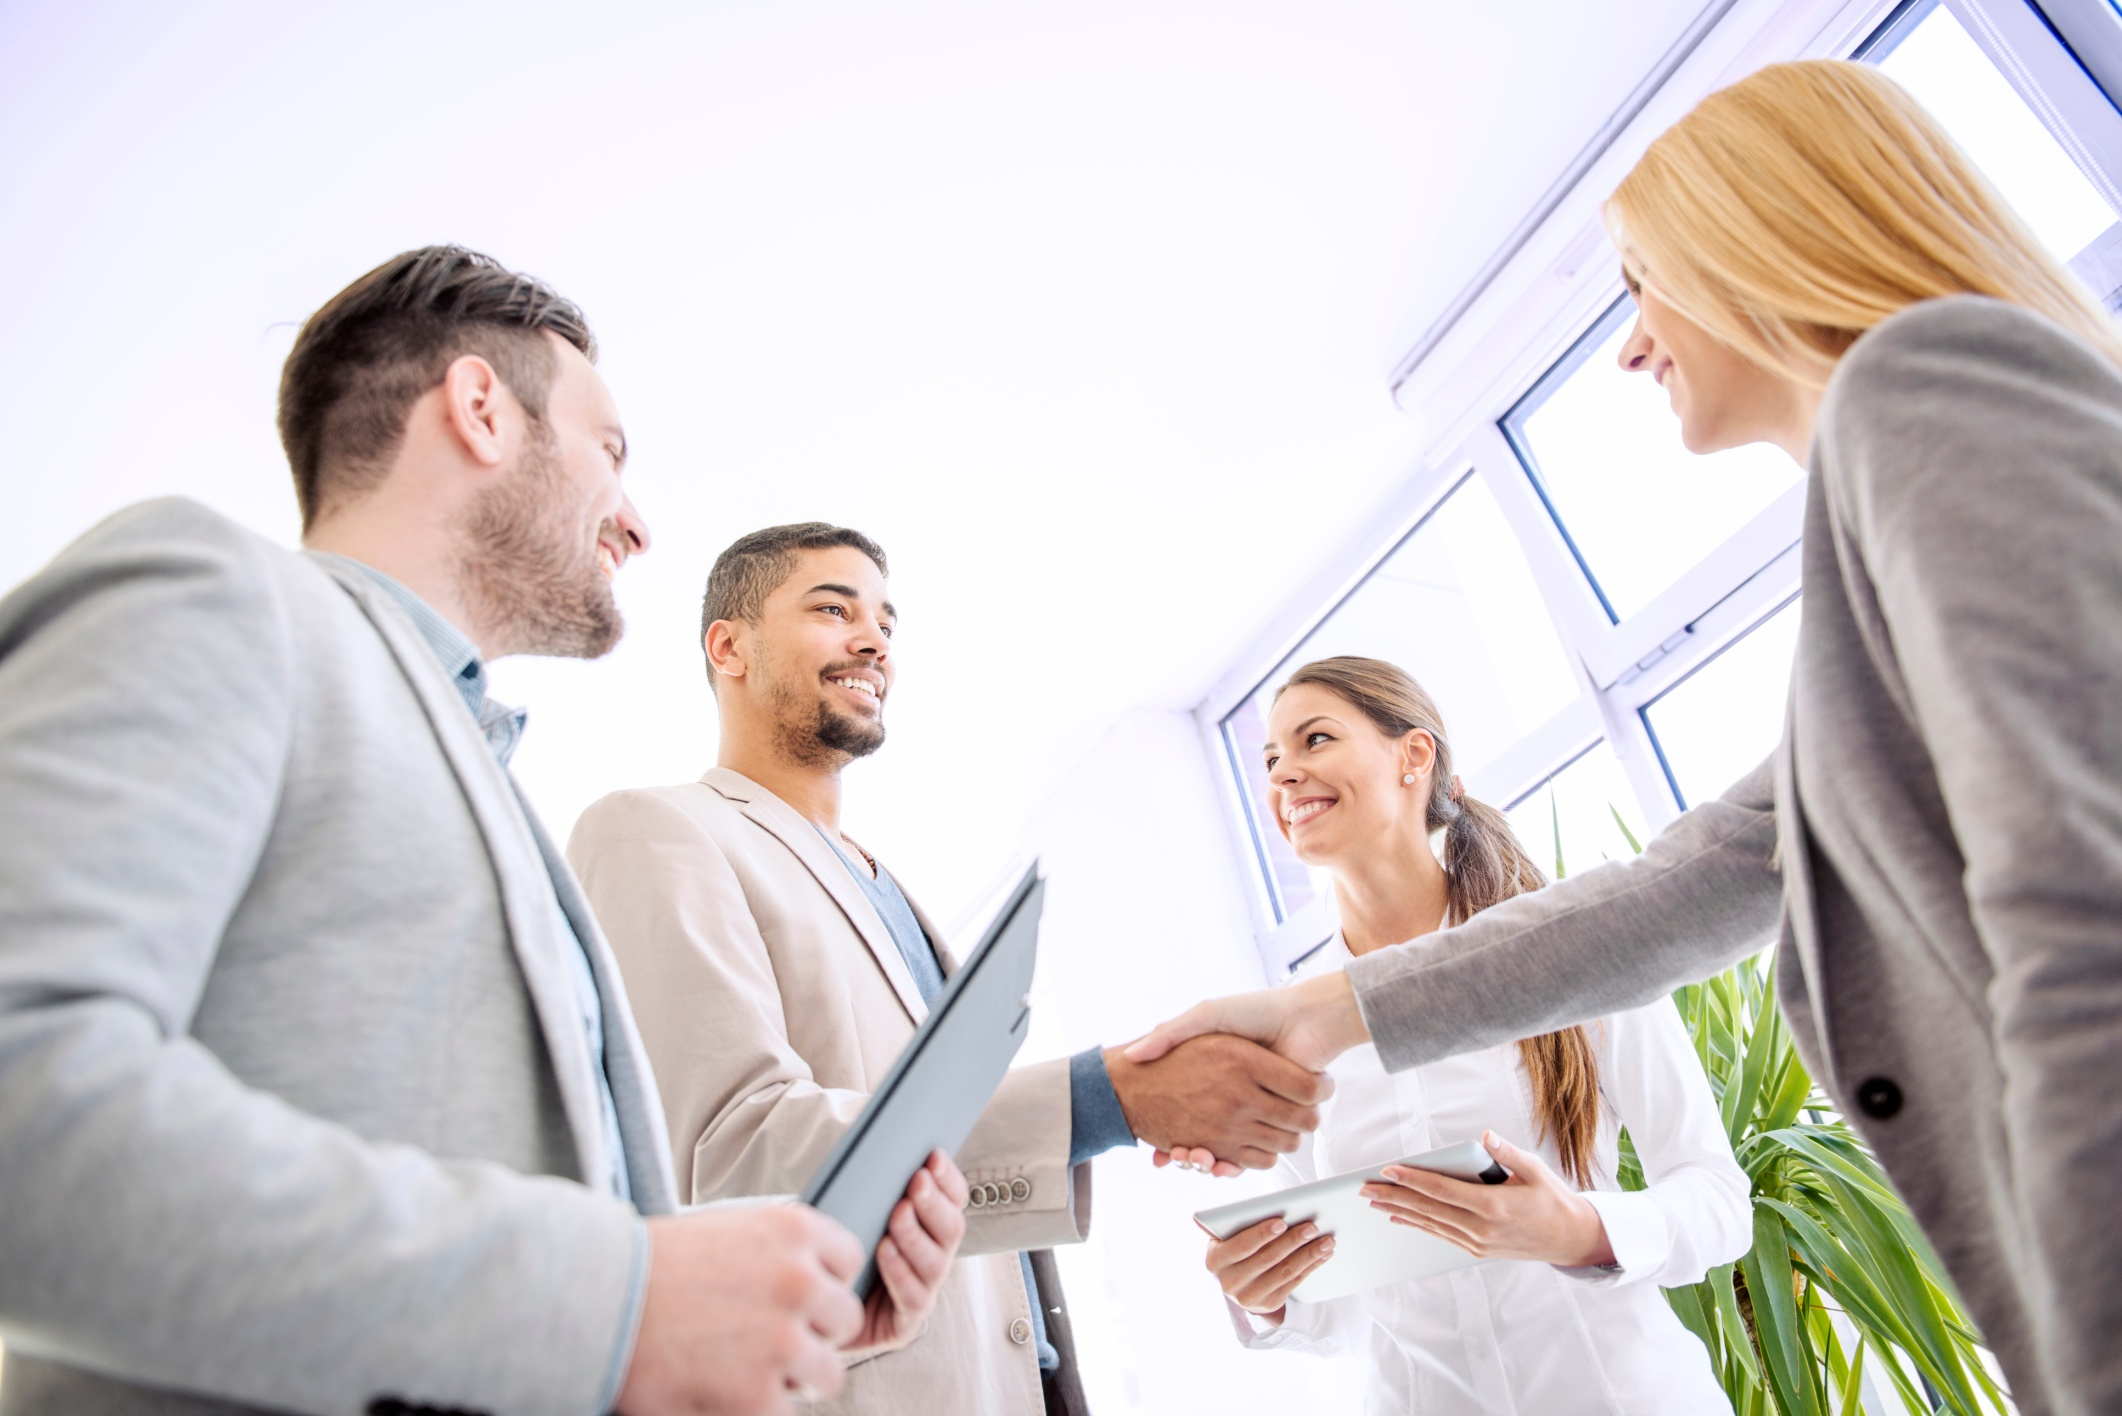 Business-meeting-shaking-hands.jpg